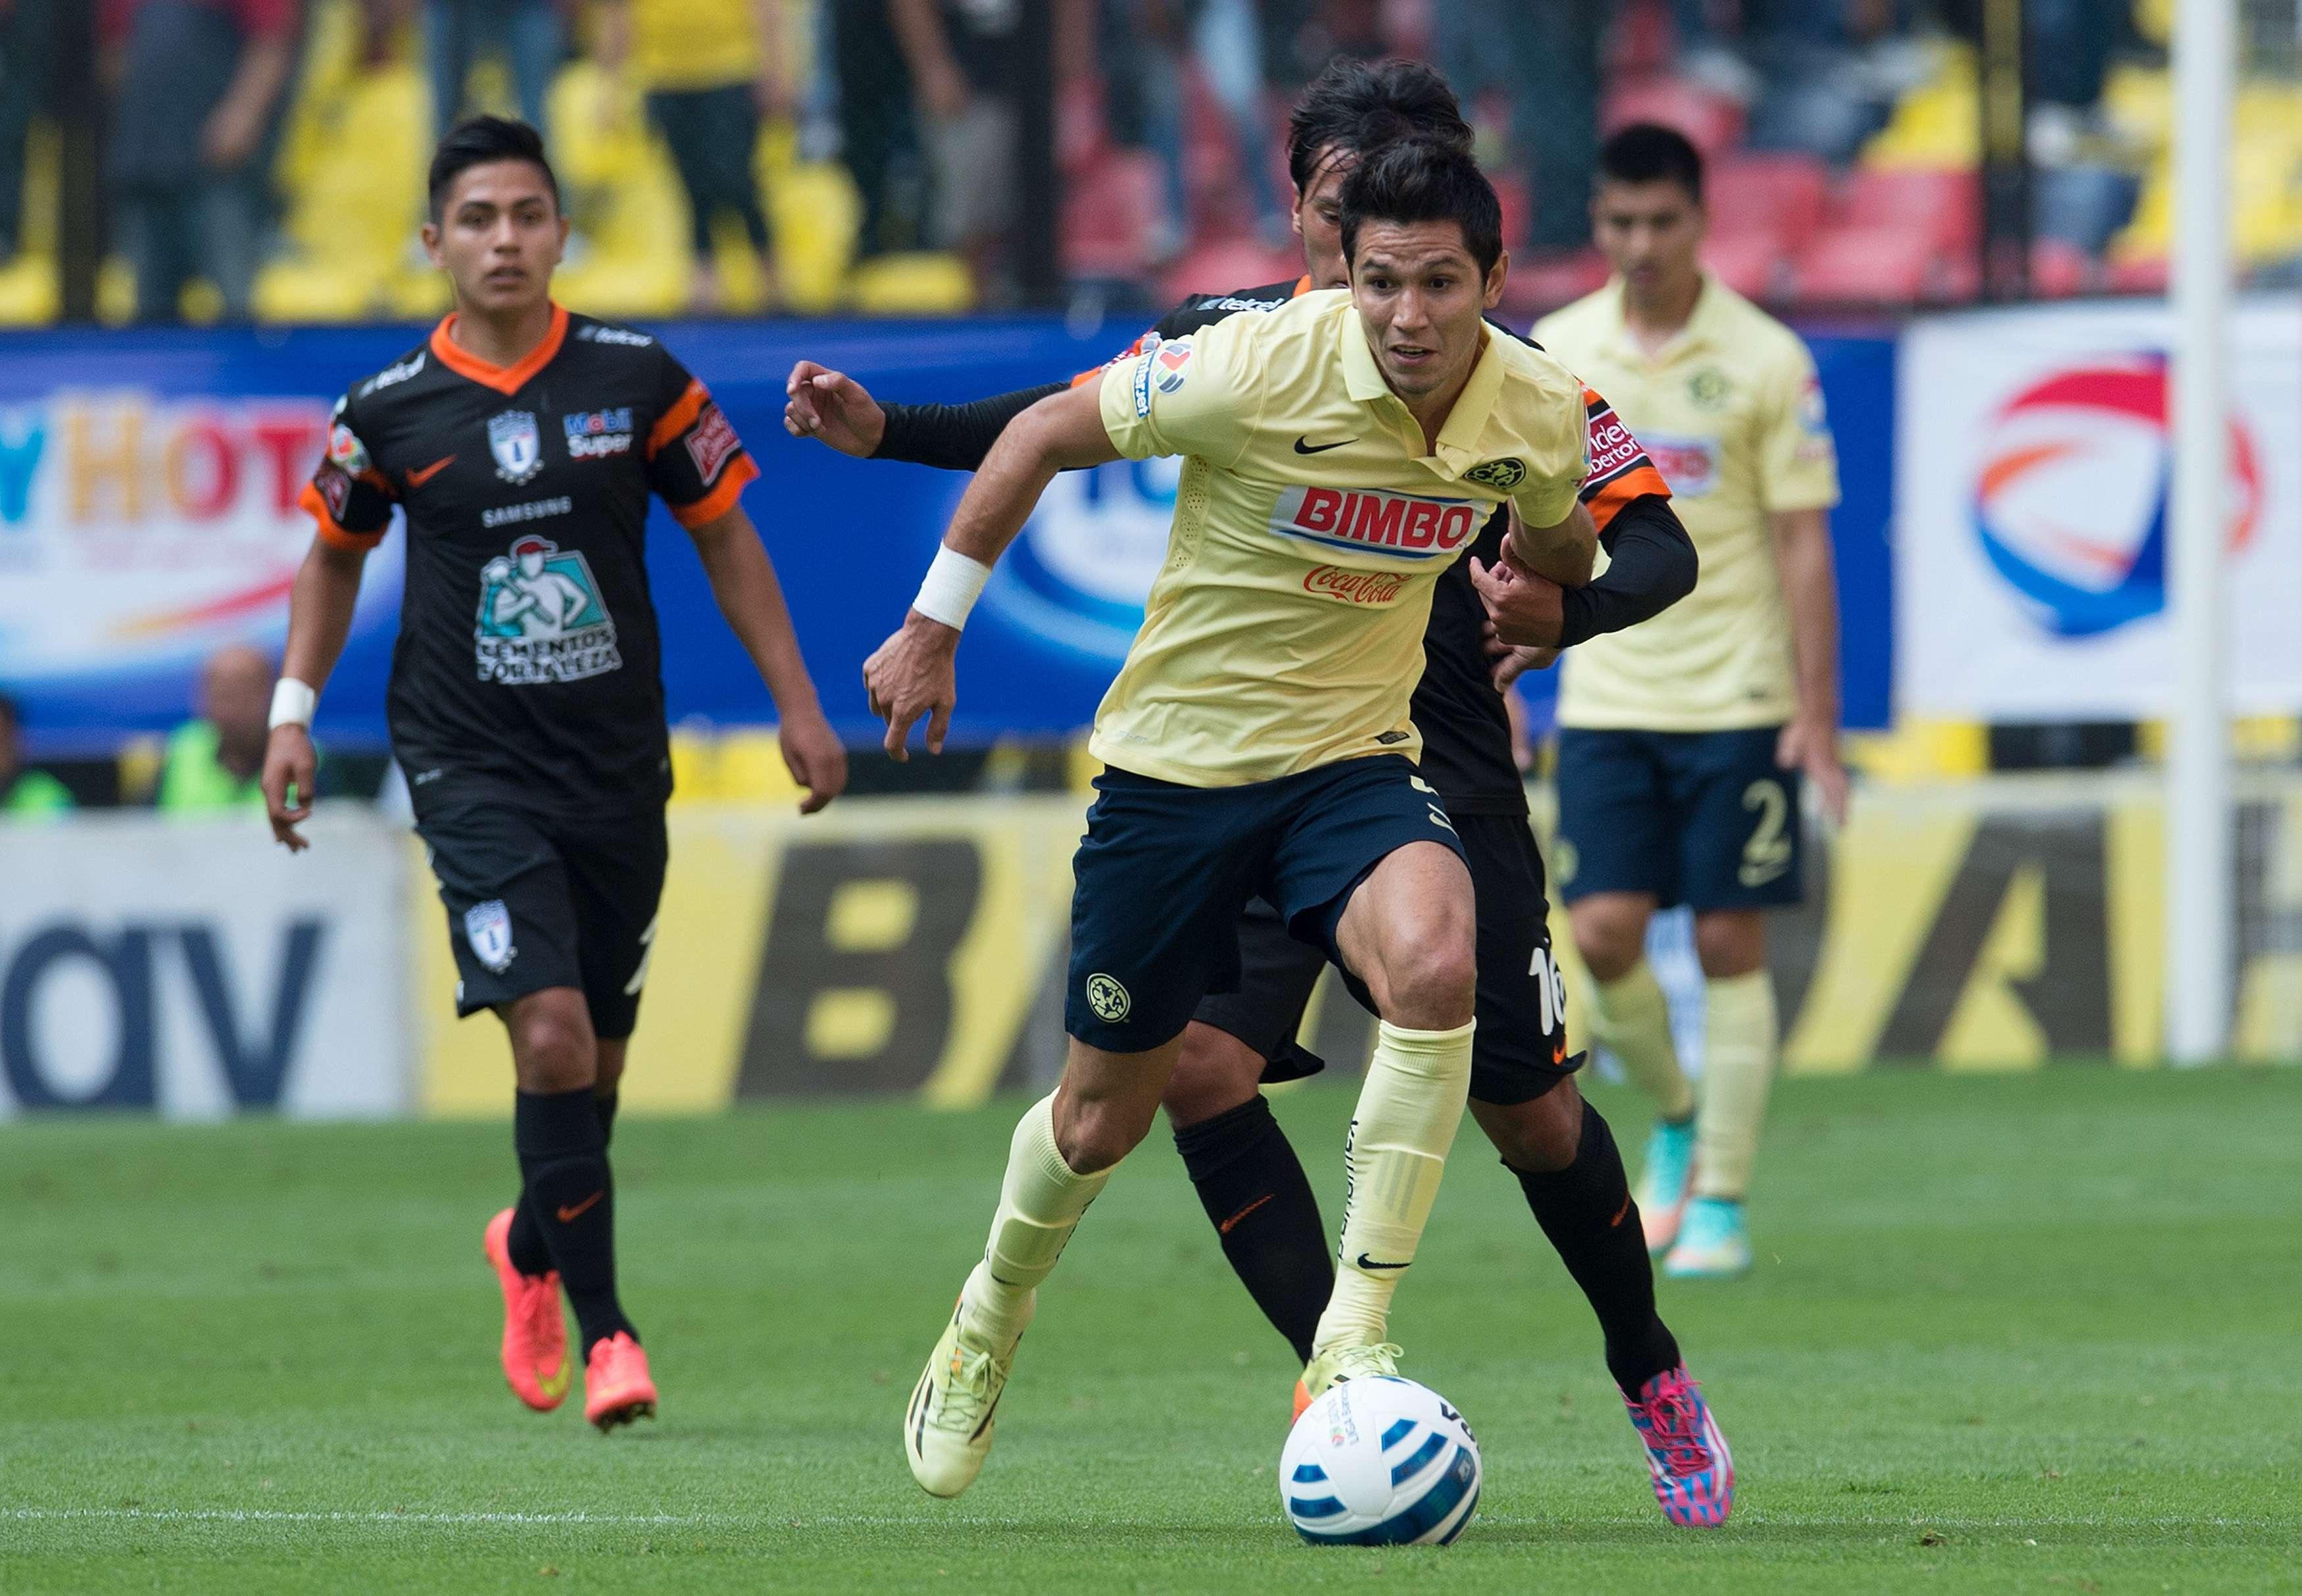 Molina disputó su sexto partido del torneo. Foto: Mexsport